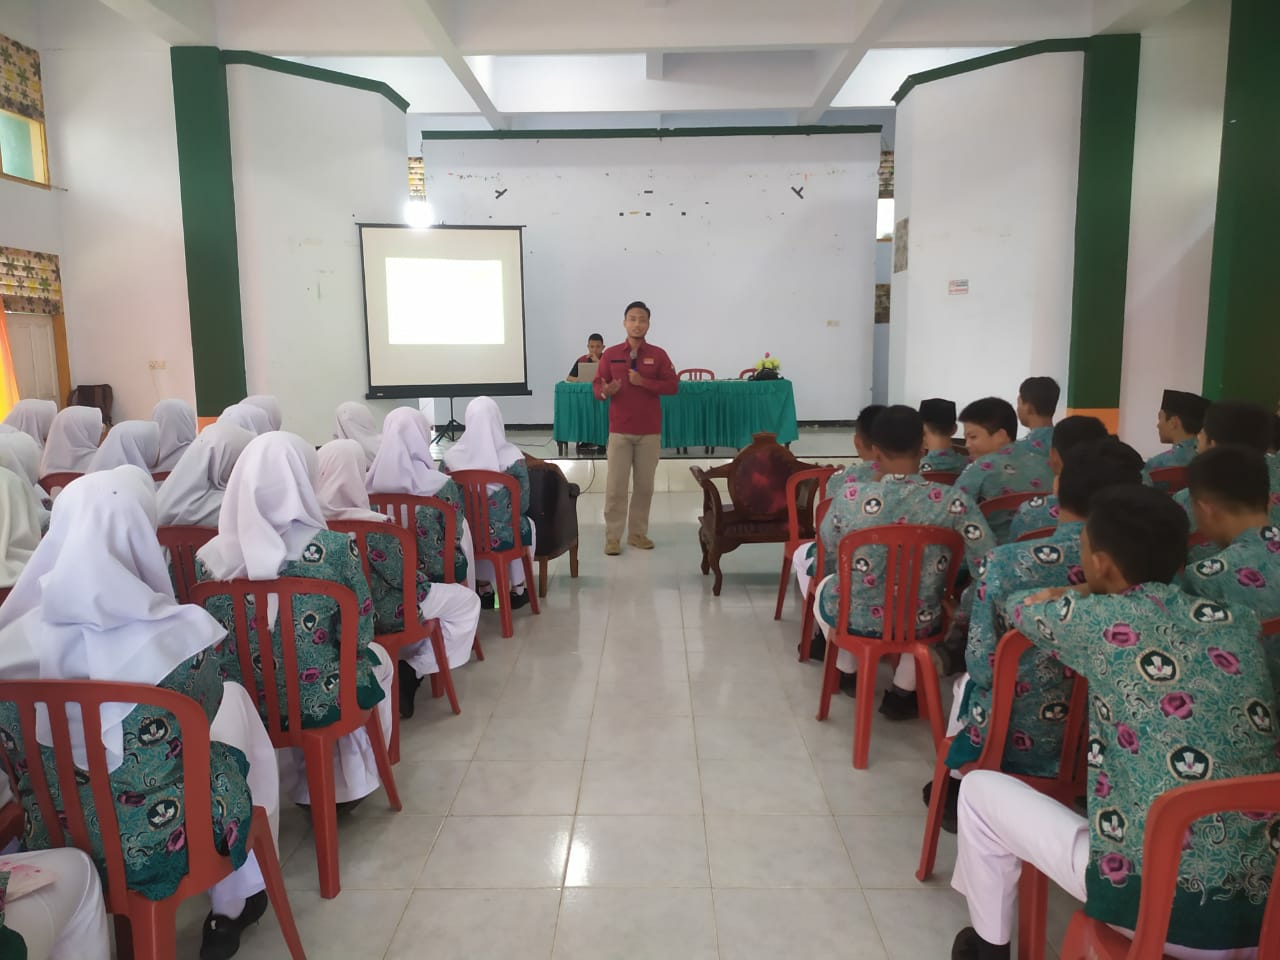 Polda Temu Netizen di SMKN 1 Kota Bengkulu